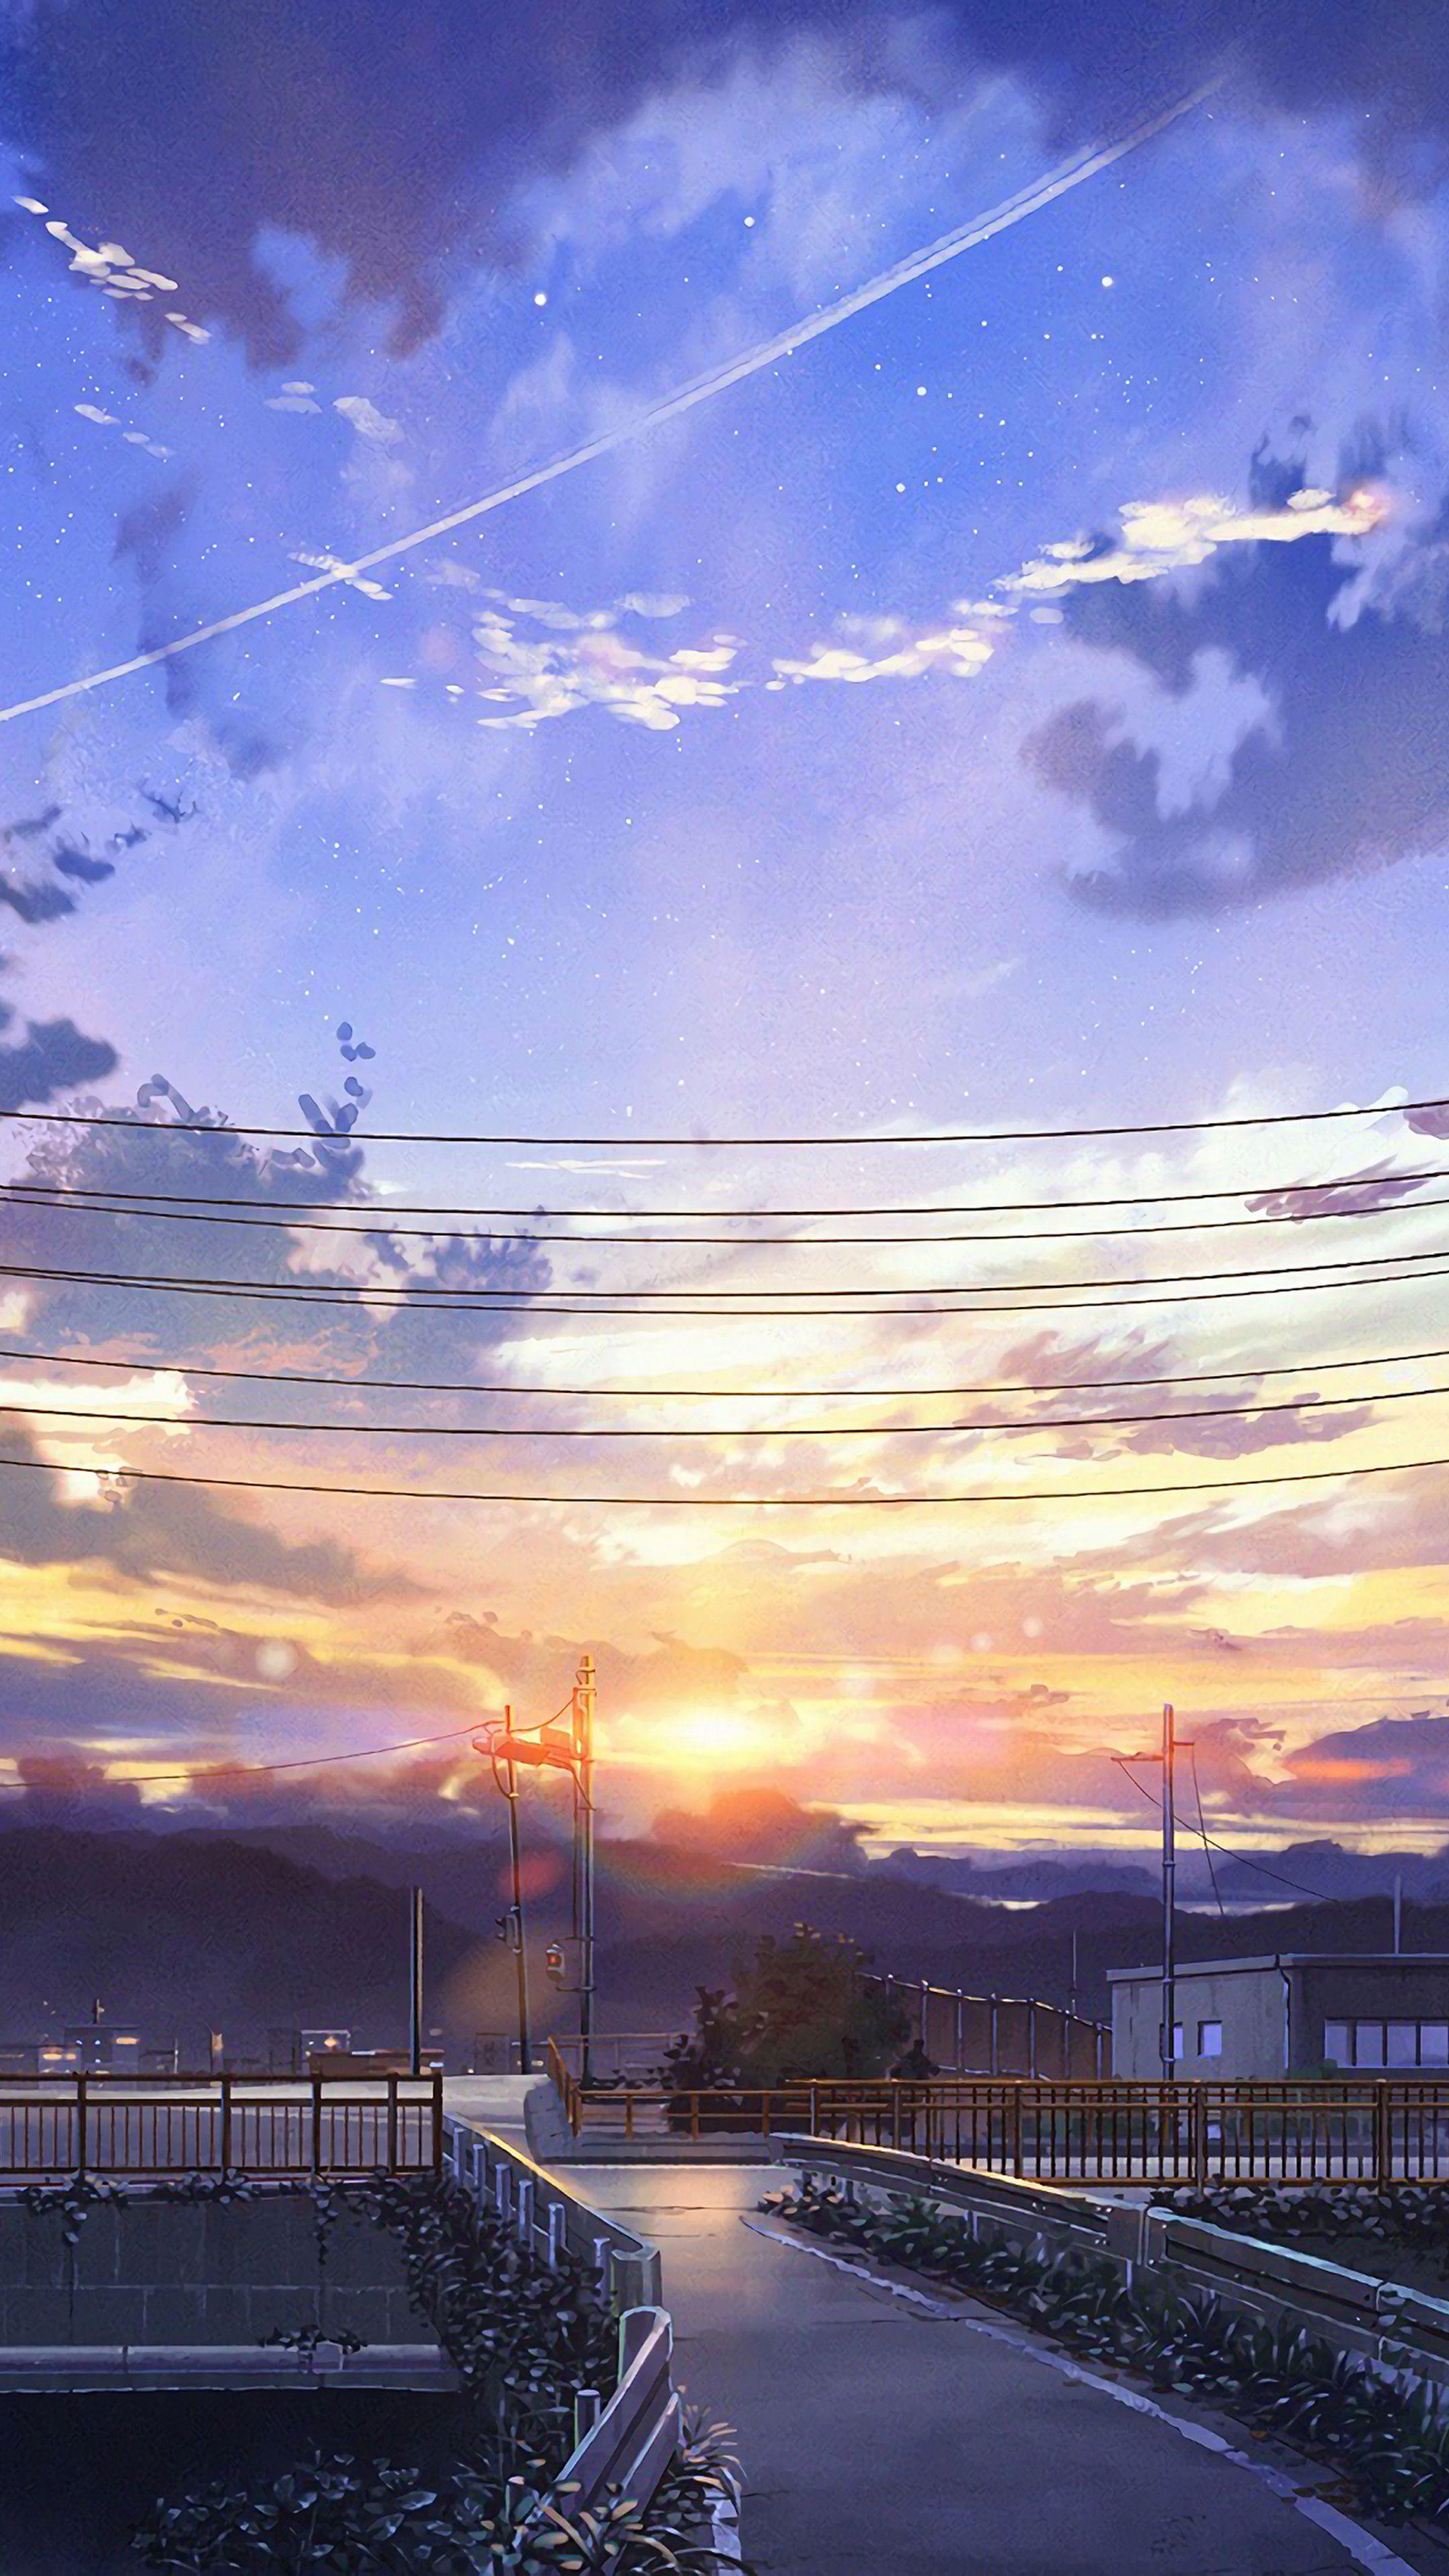 16 Wallpaper Anime 4k Mobile Orochi Wallpaper Anime Scenery Wallpaper Anime Wallpaper Phone Anime Wallpaper Download